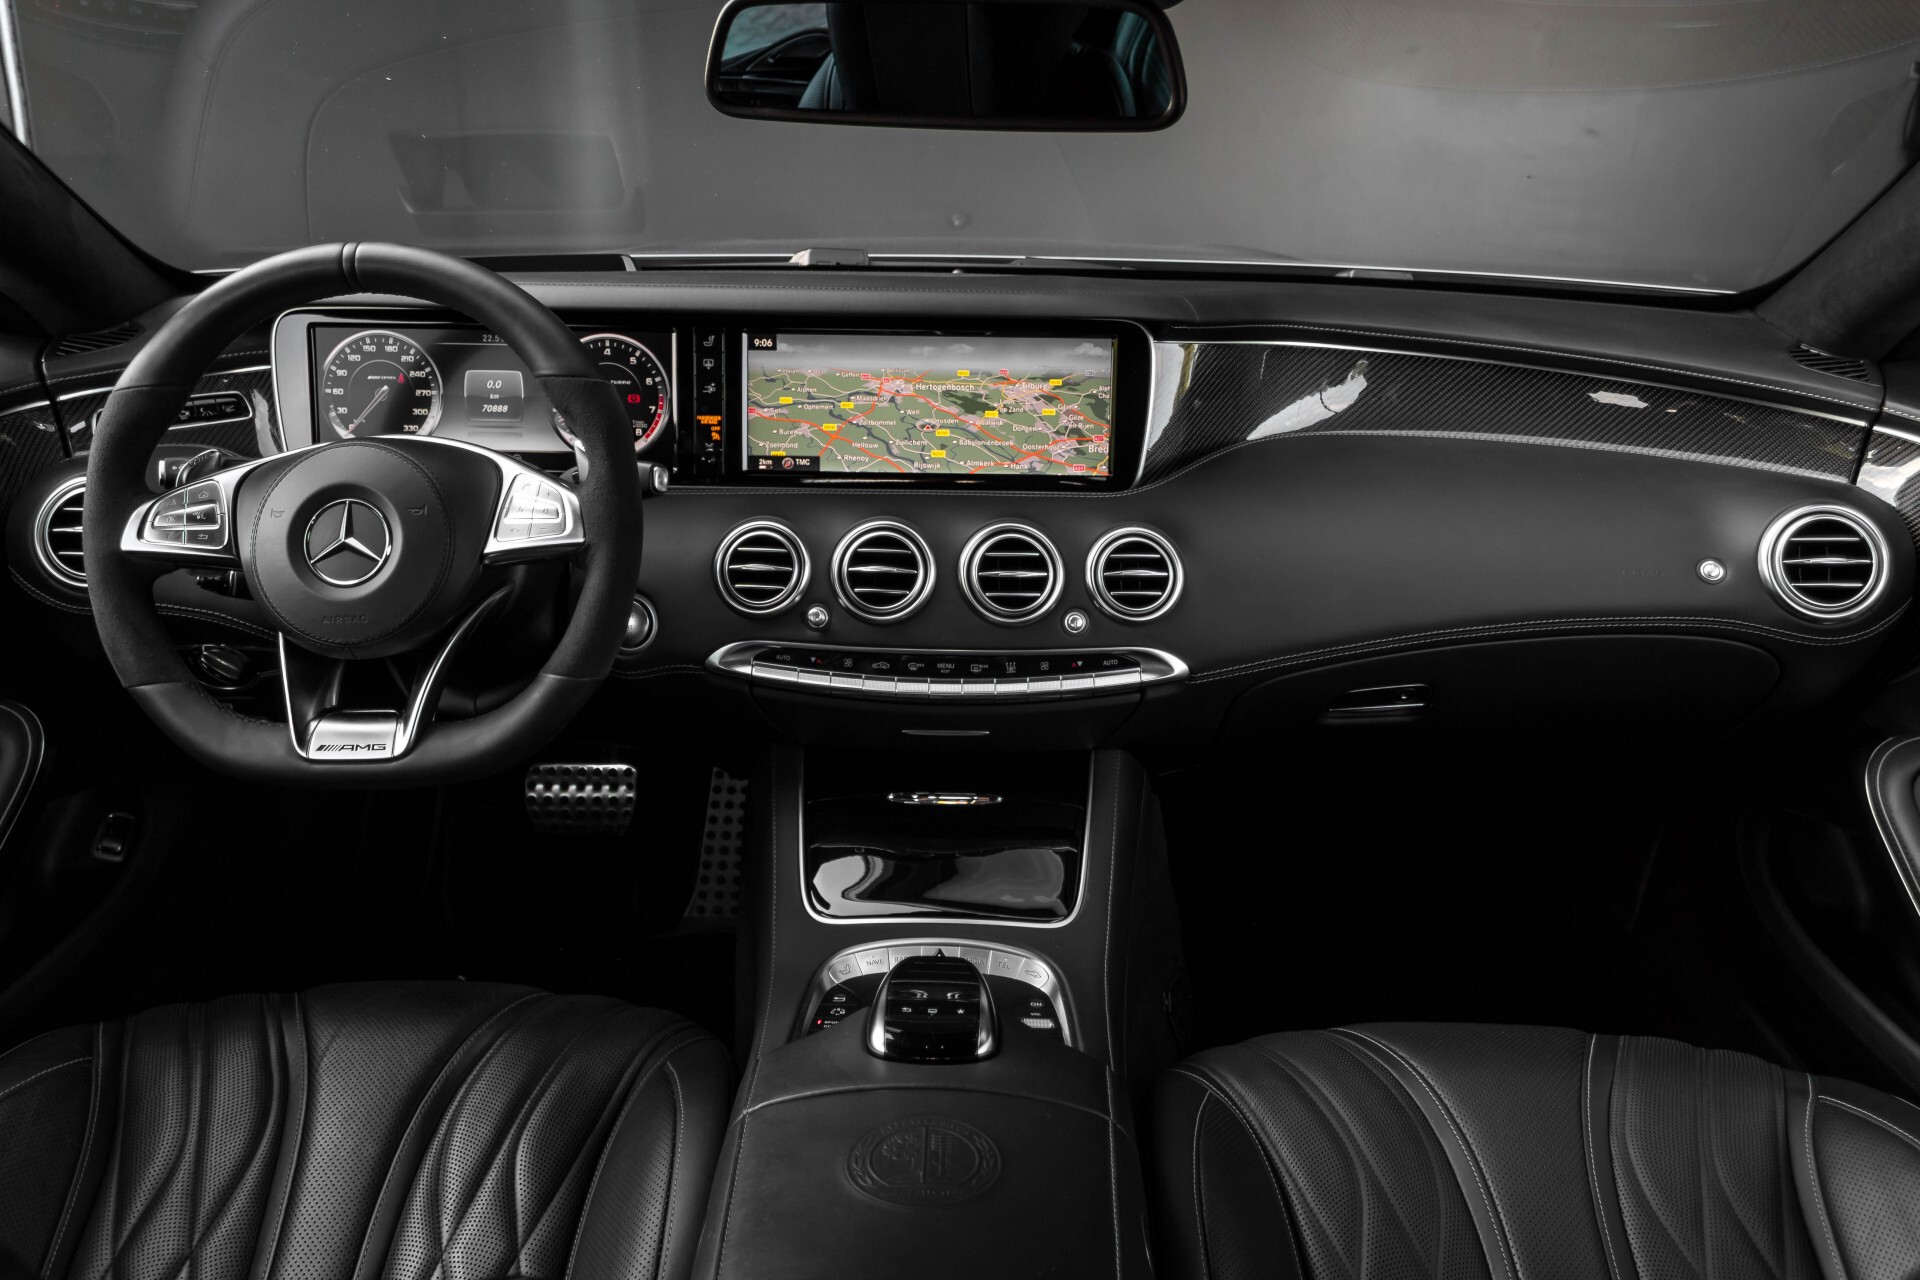 Mercedes-Benz S-Klasse Coupé 63 AMG 4-M Keramisch/Akrapovic/Swarowski/Designo/Burmester High End Aut7 Foto 7